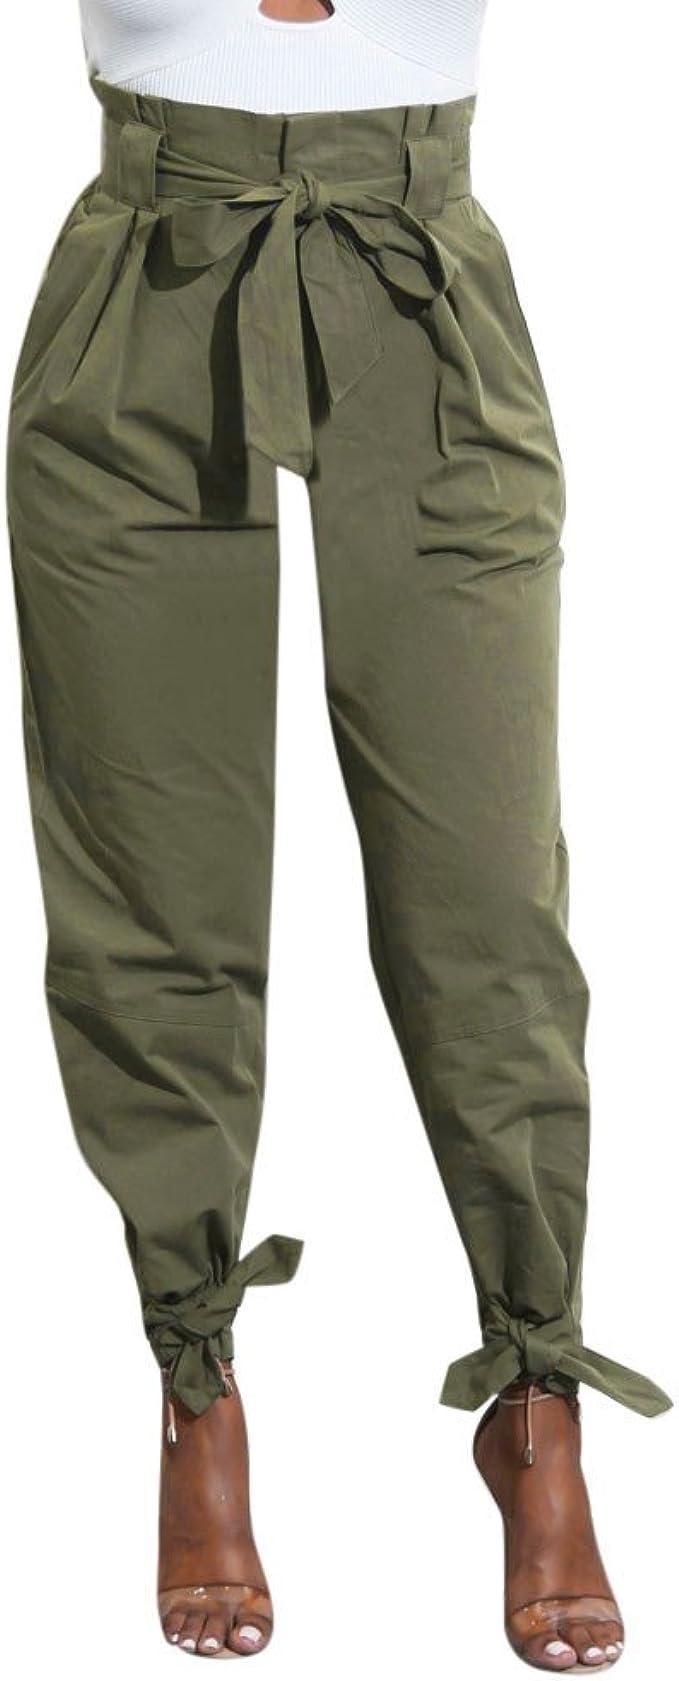 Amazon.com: GoodLock - Pantalones de cintura alta con ...